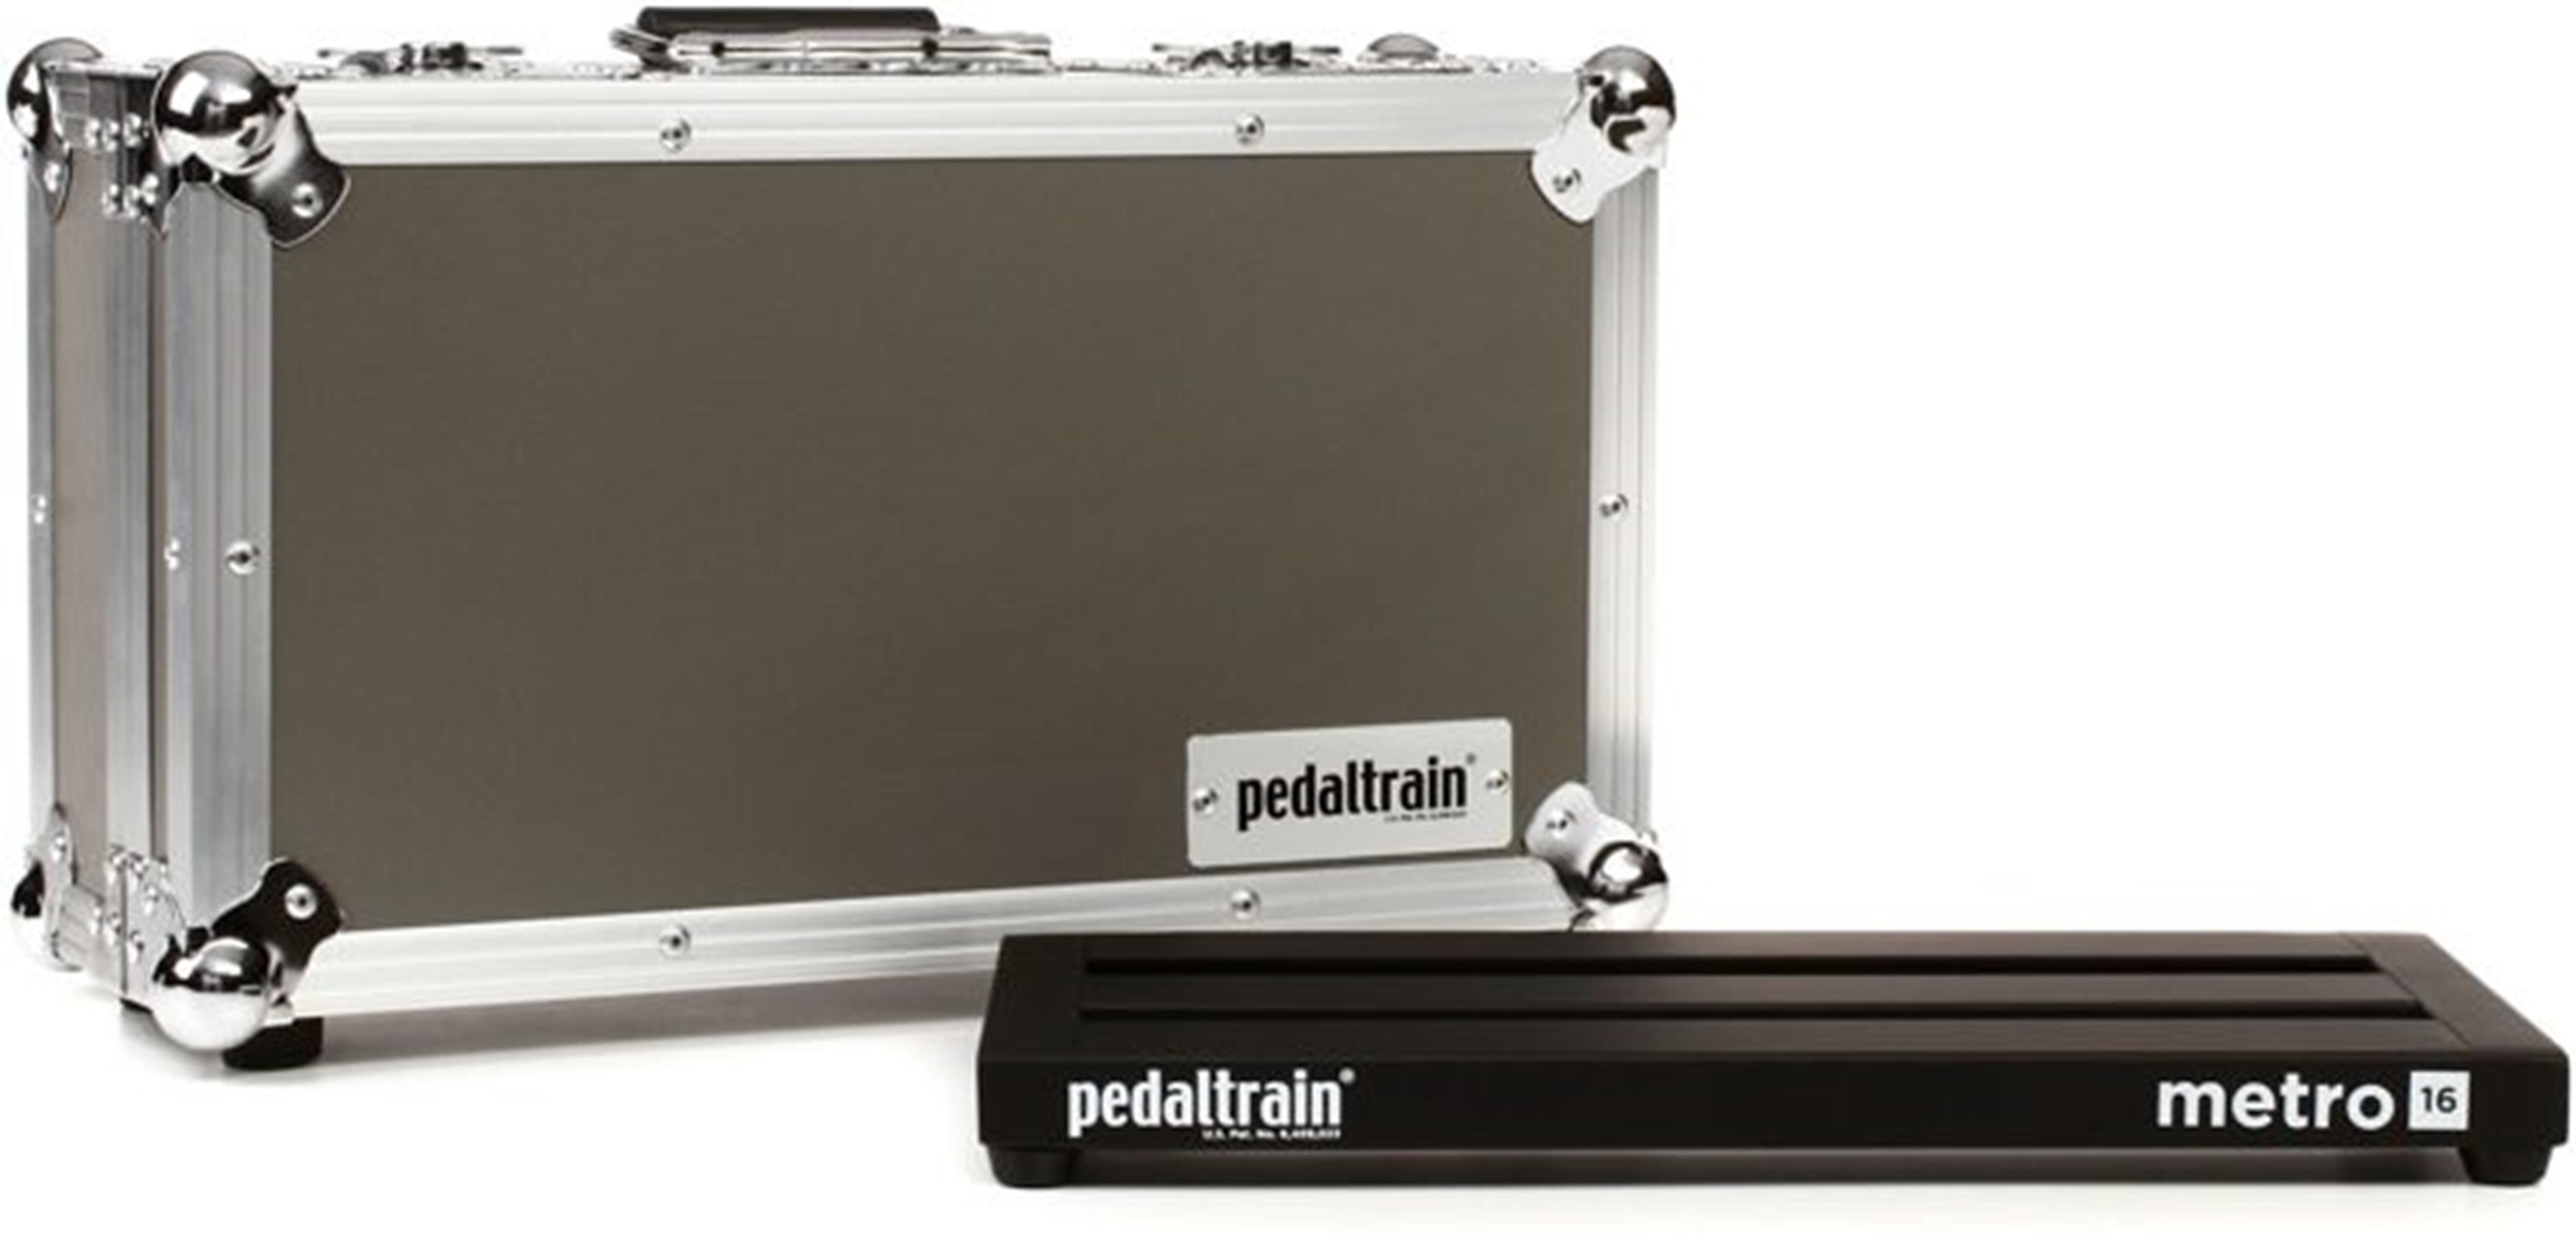 PEDALTRAIN METRO 16 TOUR CASE